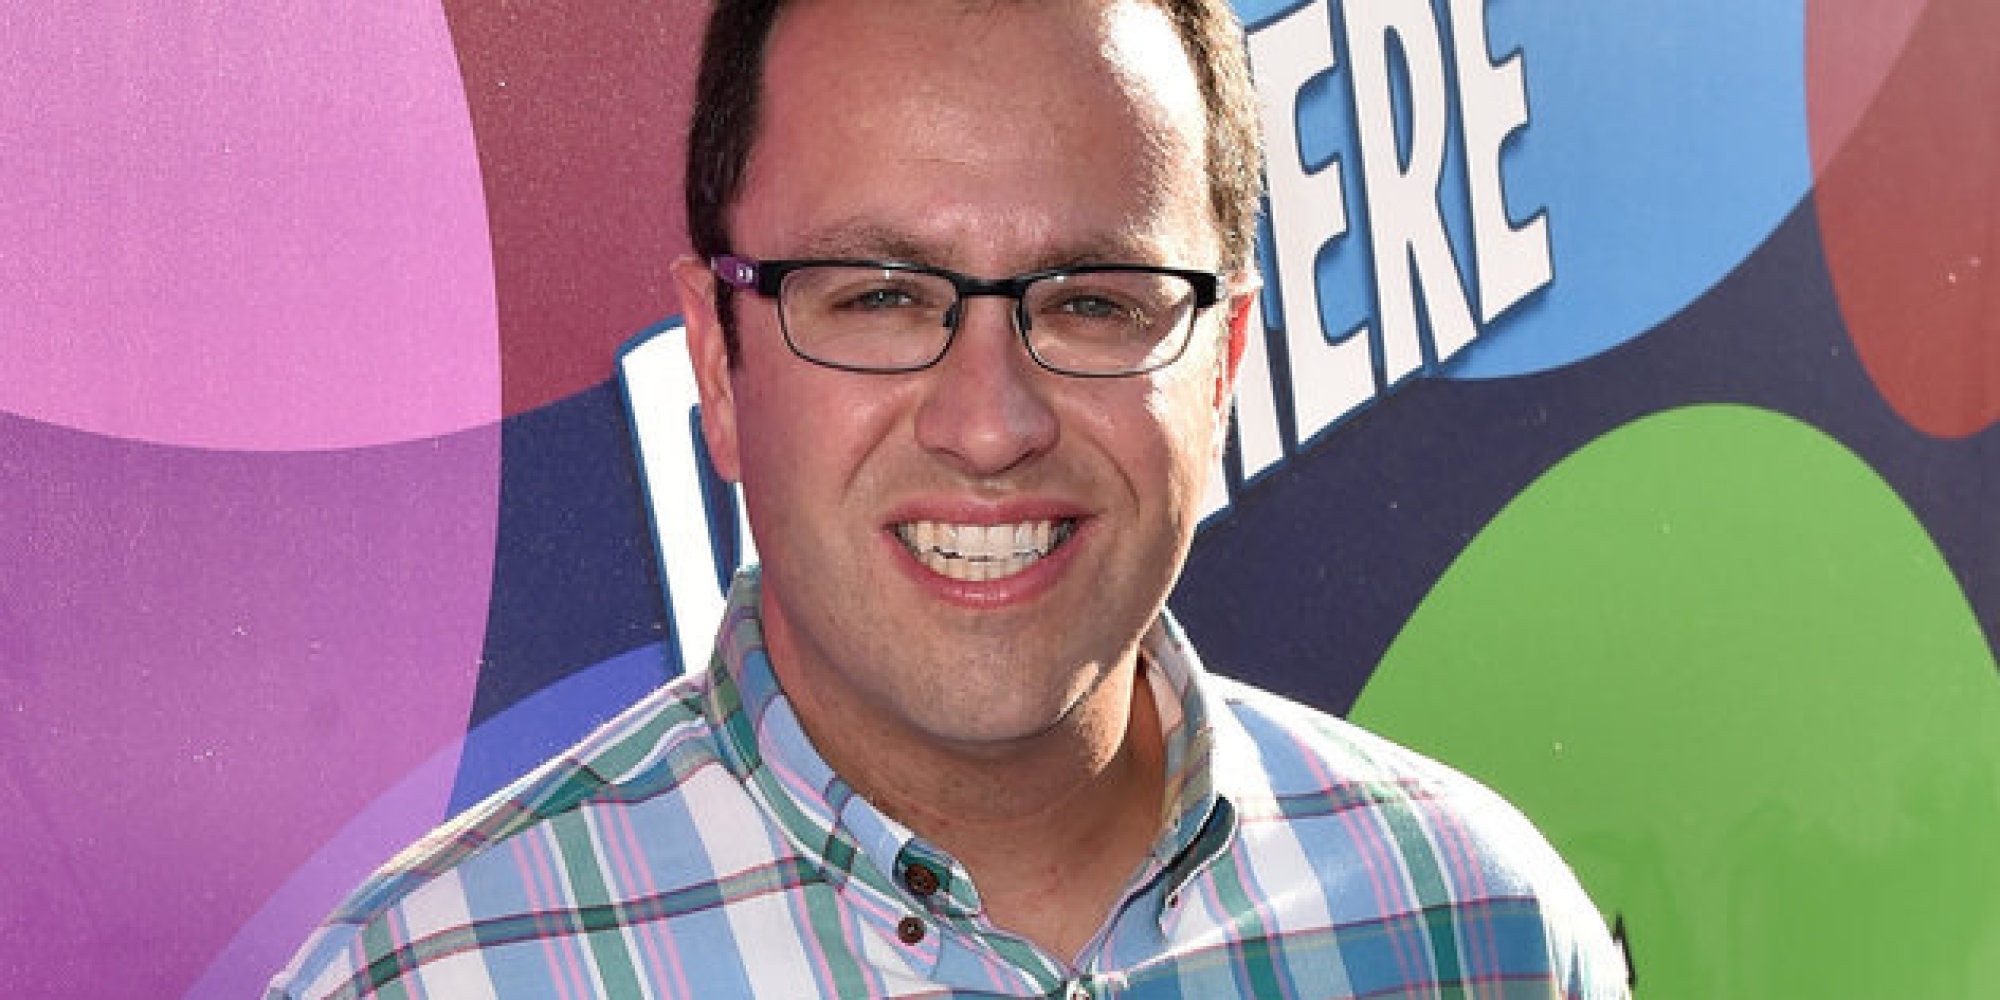 Jared Fogle, Subway Spokesman, Detained, Home Raided